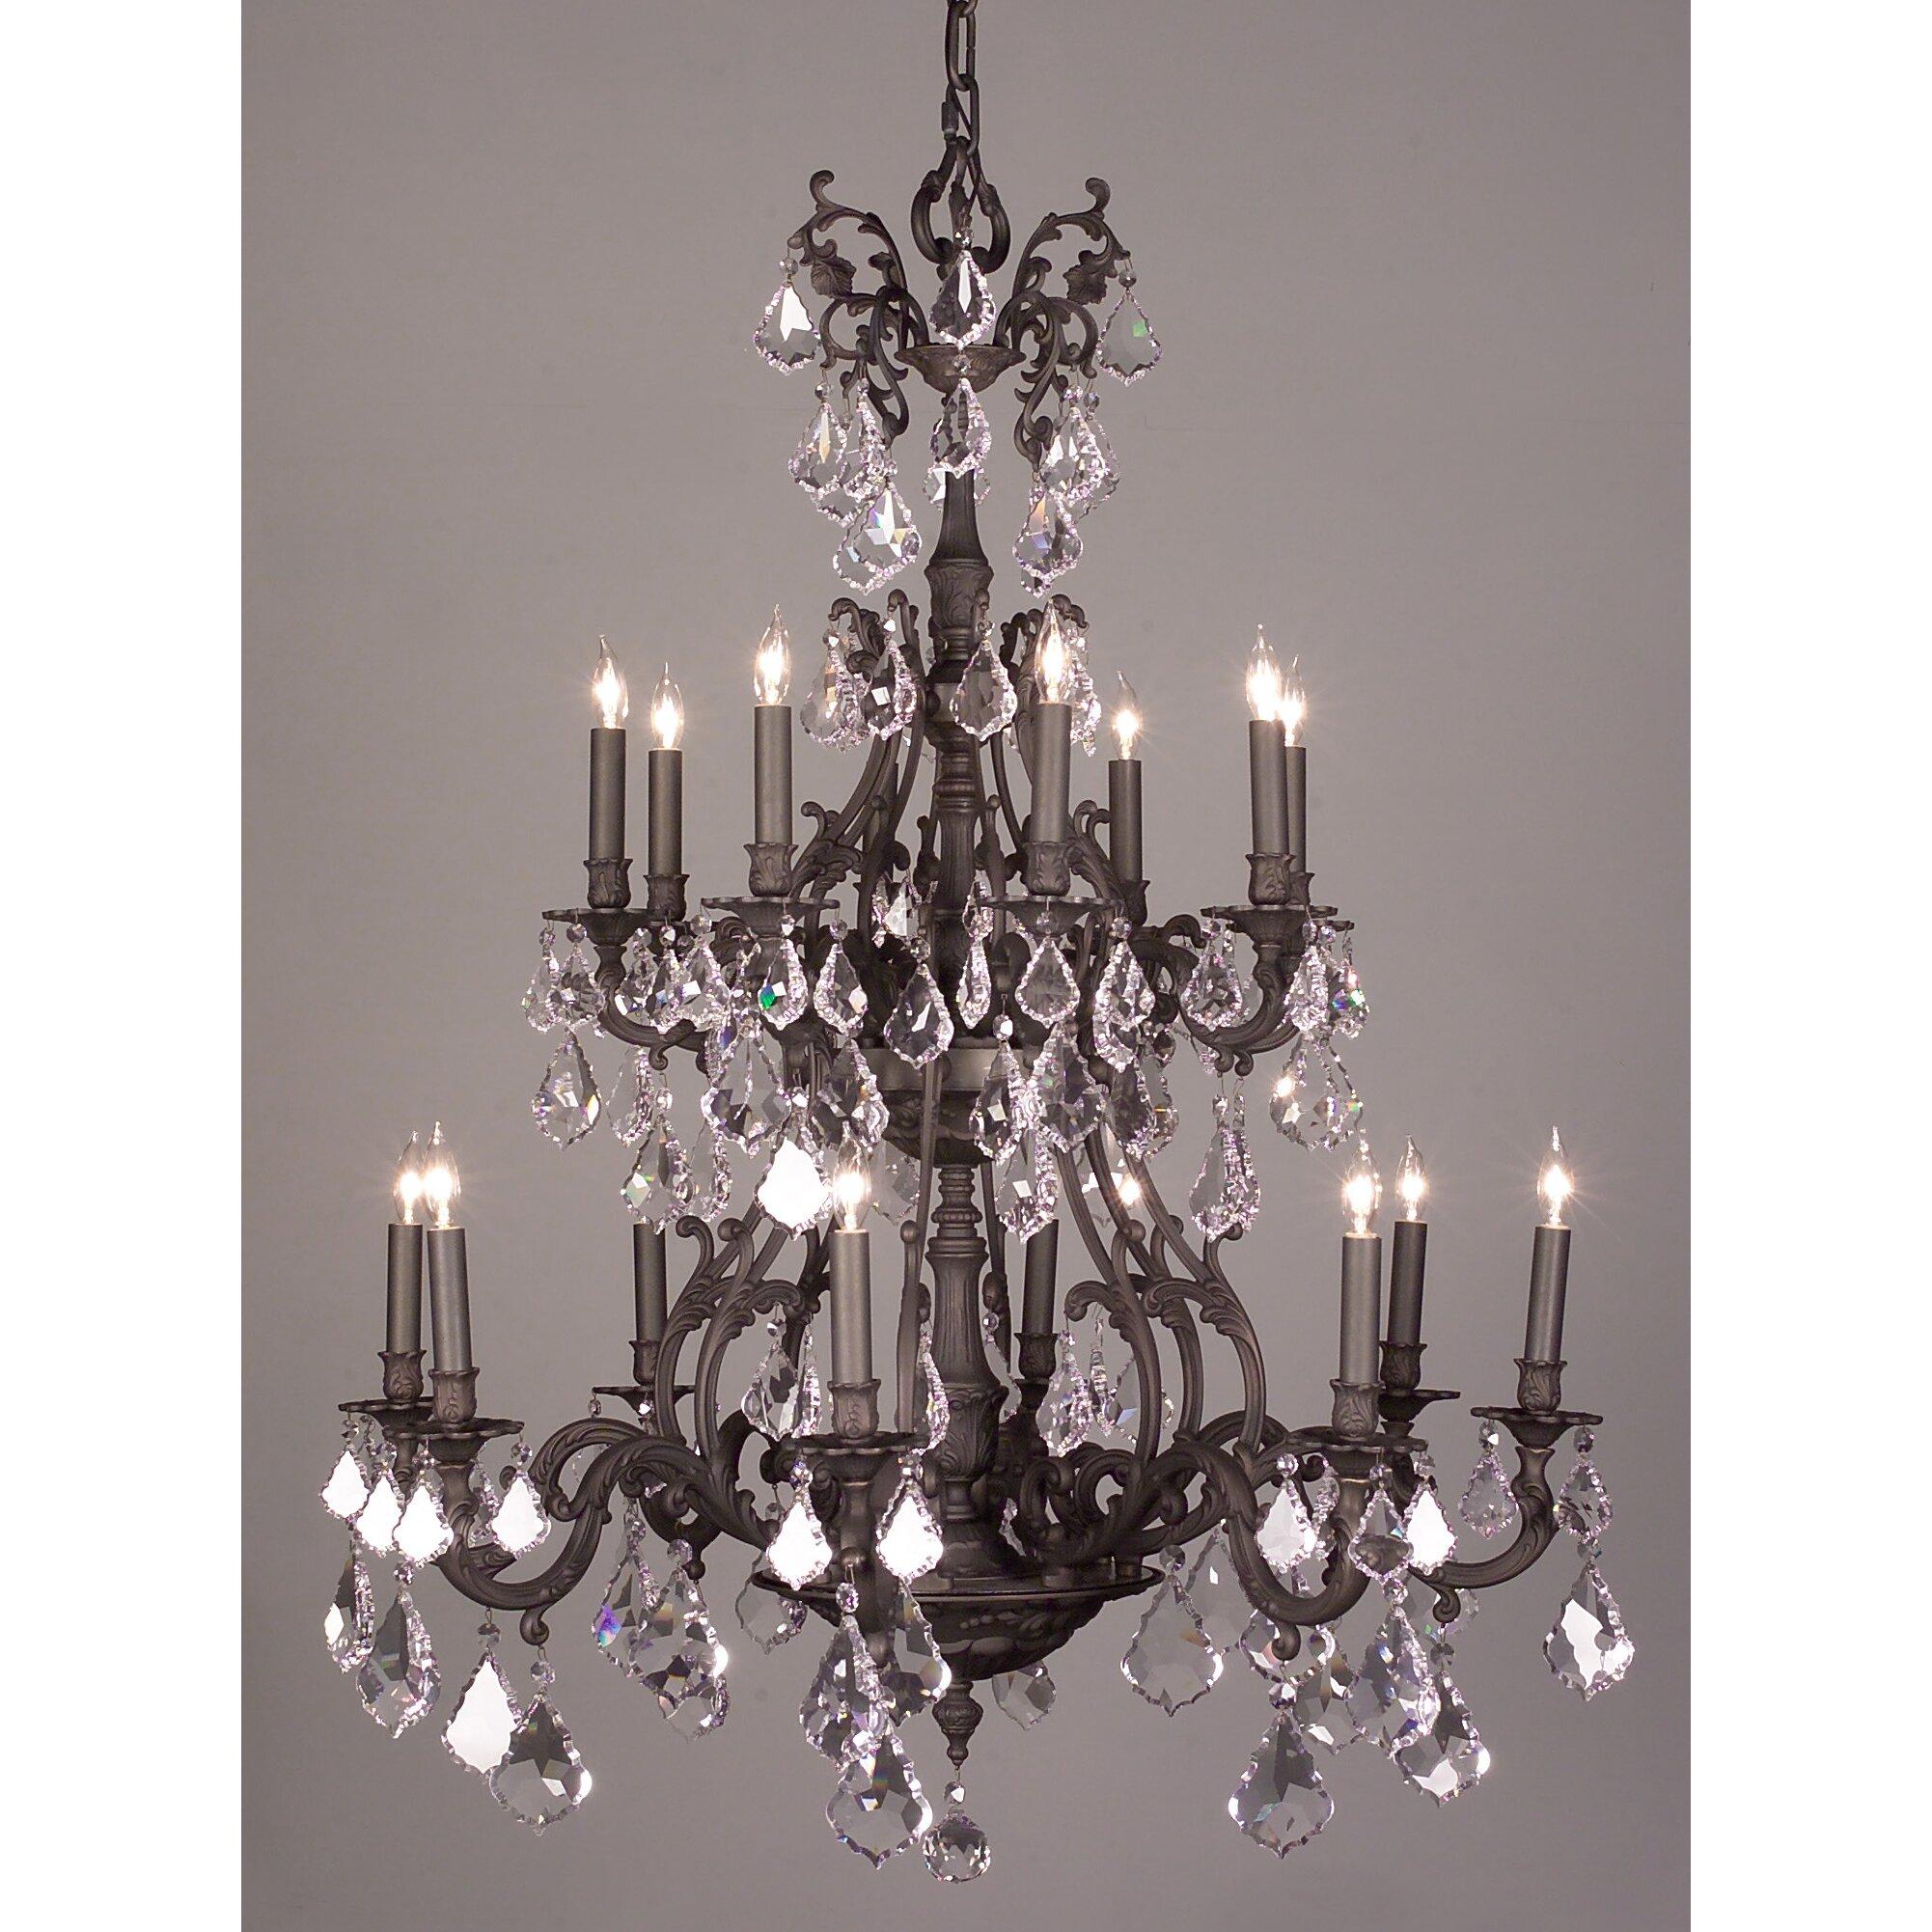 Classic Lighting Majestic 16 Light Crystal Chandelier